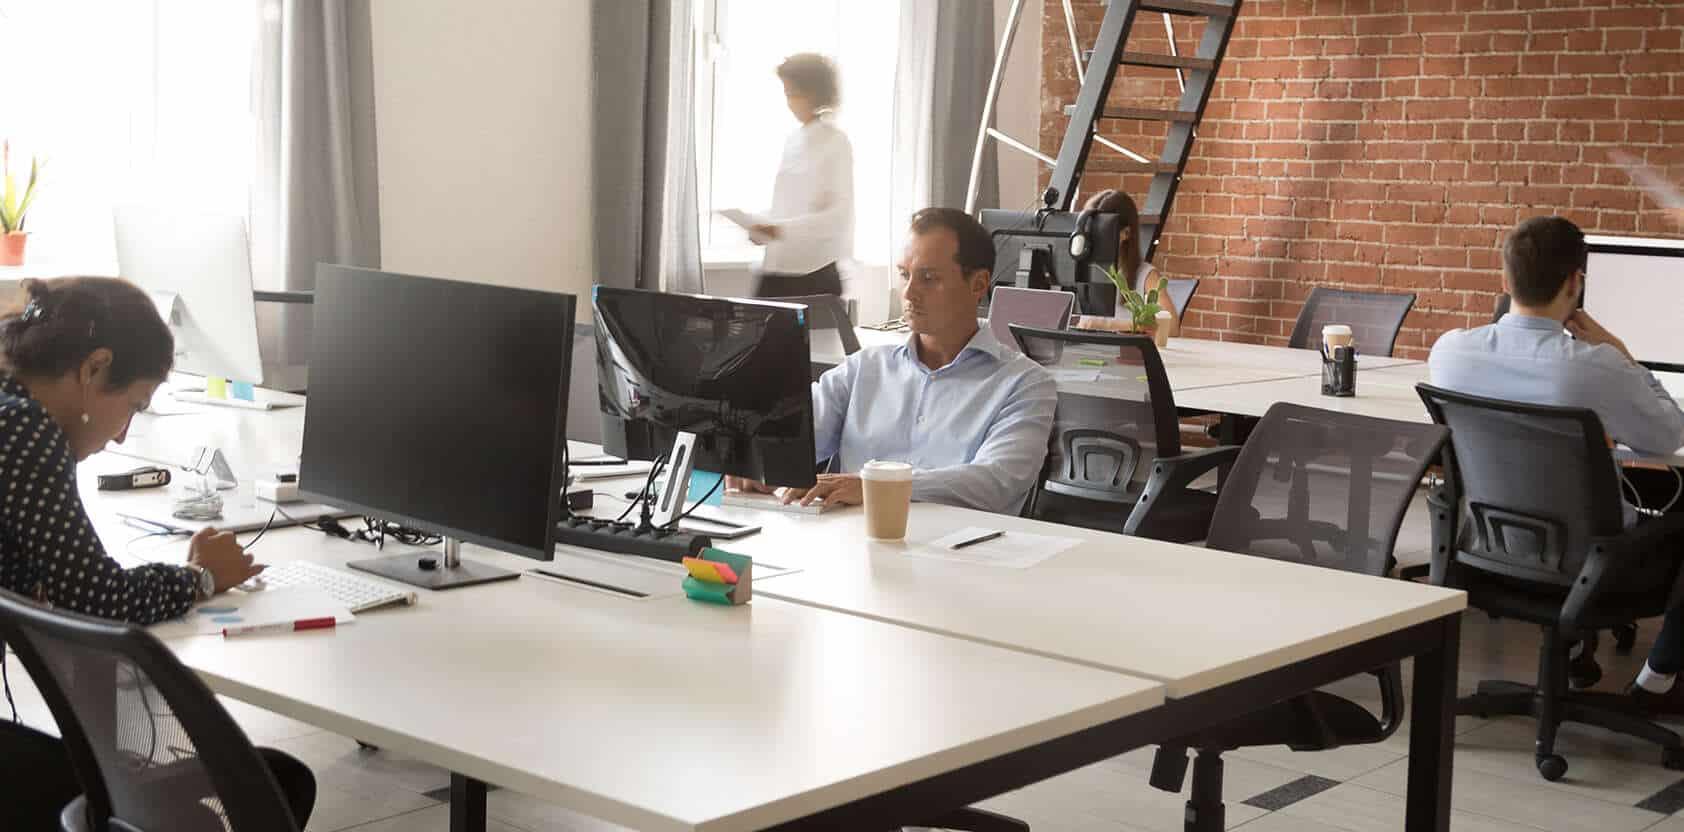 bureaux-ordinateur-salaries